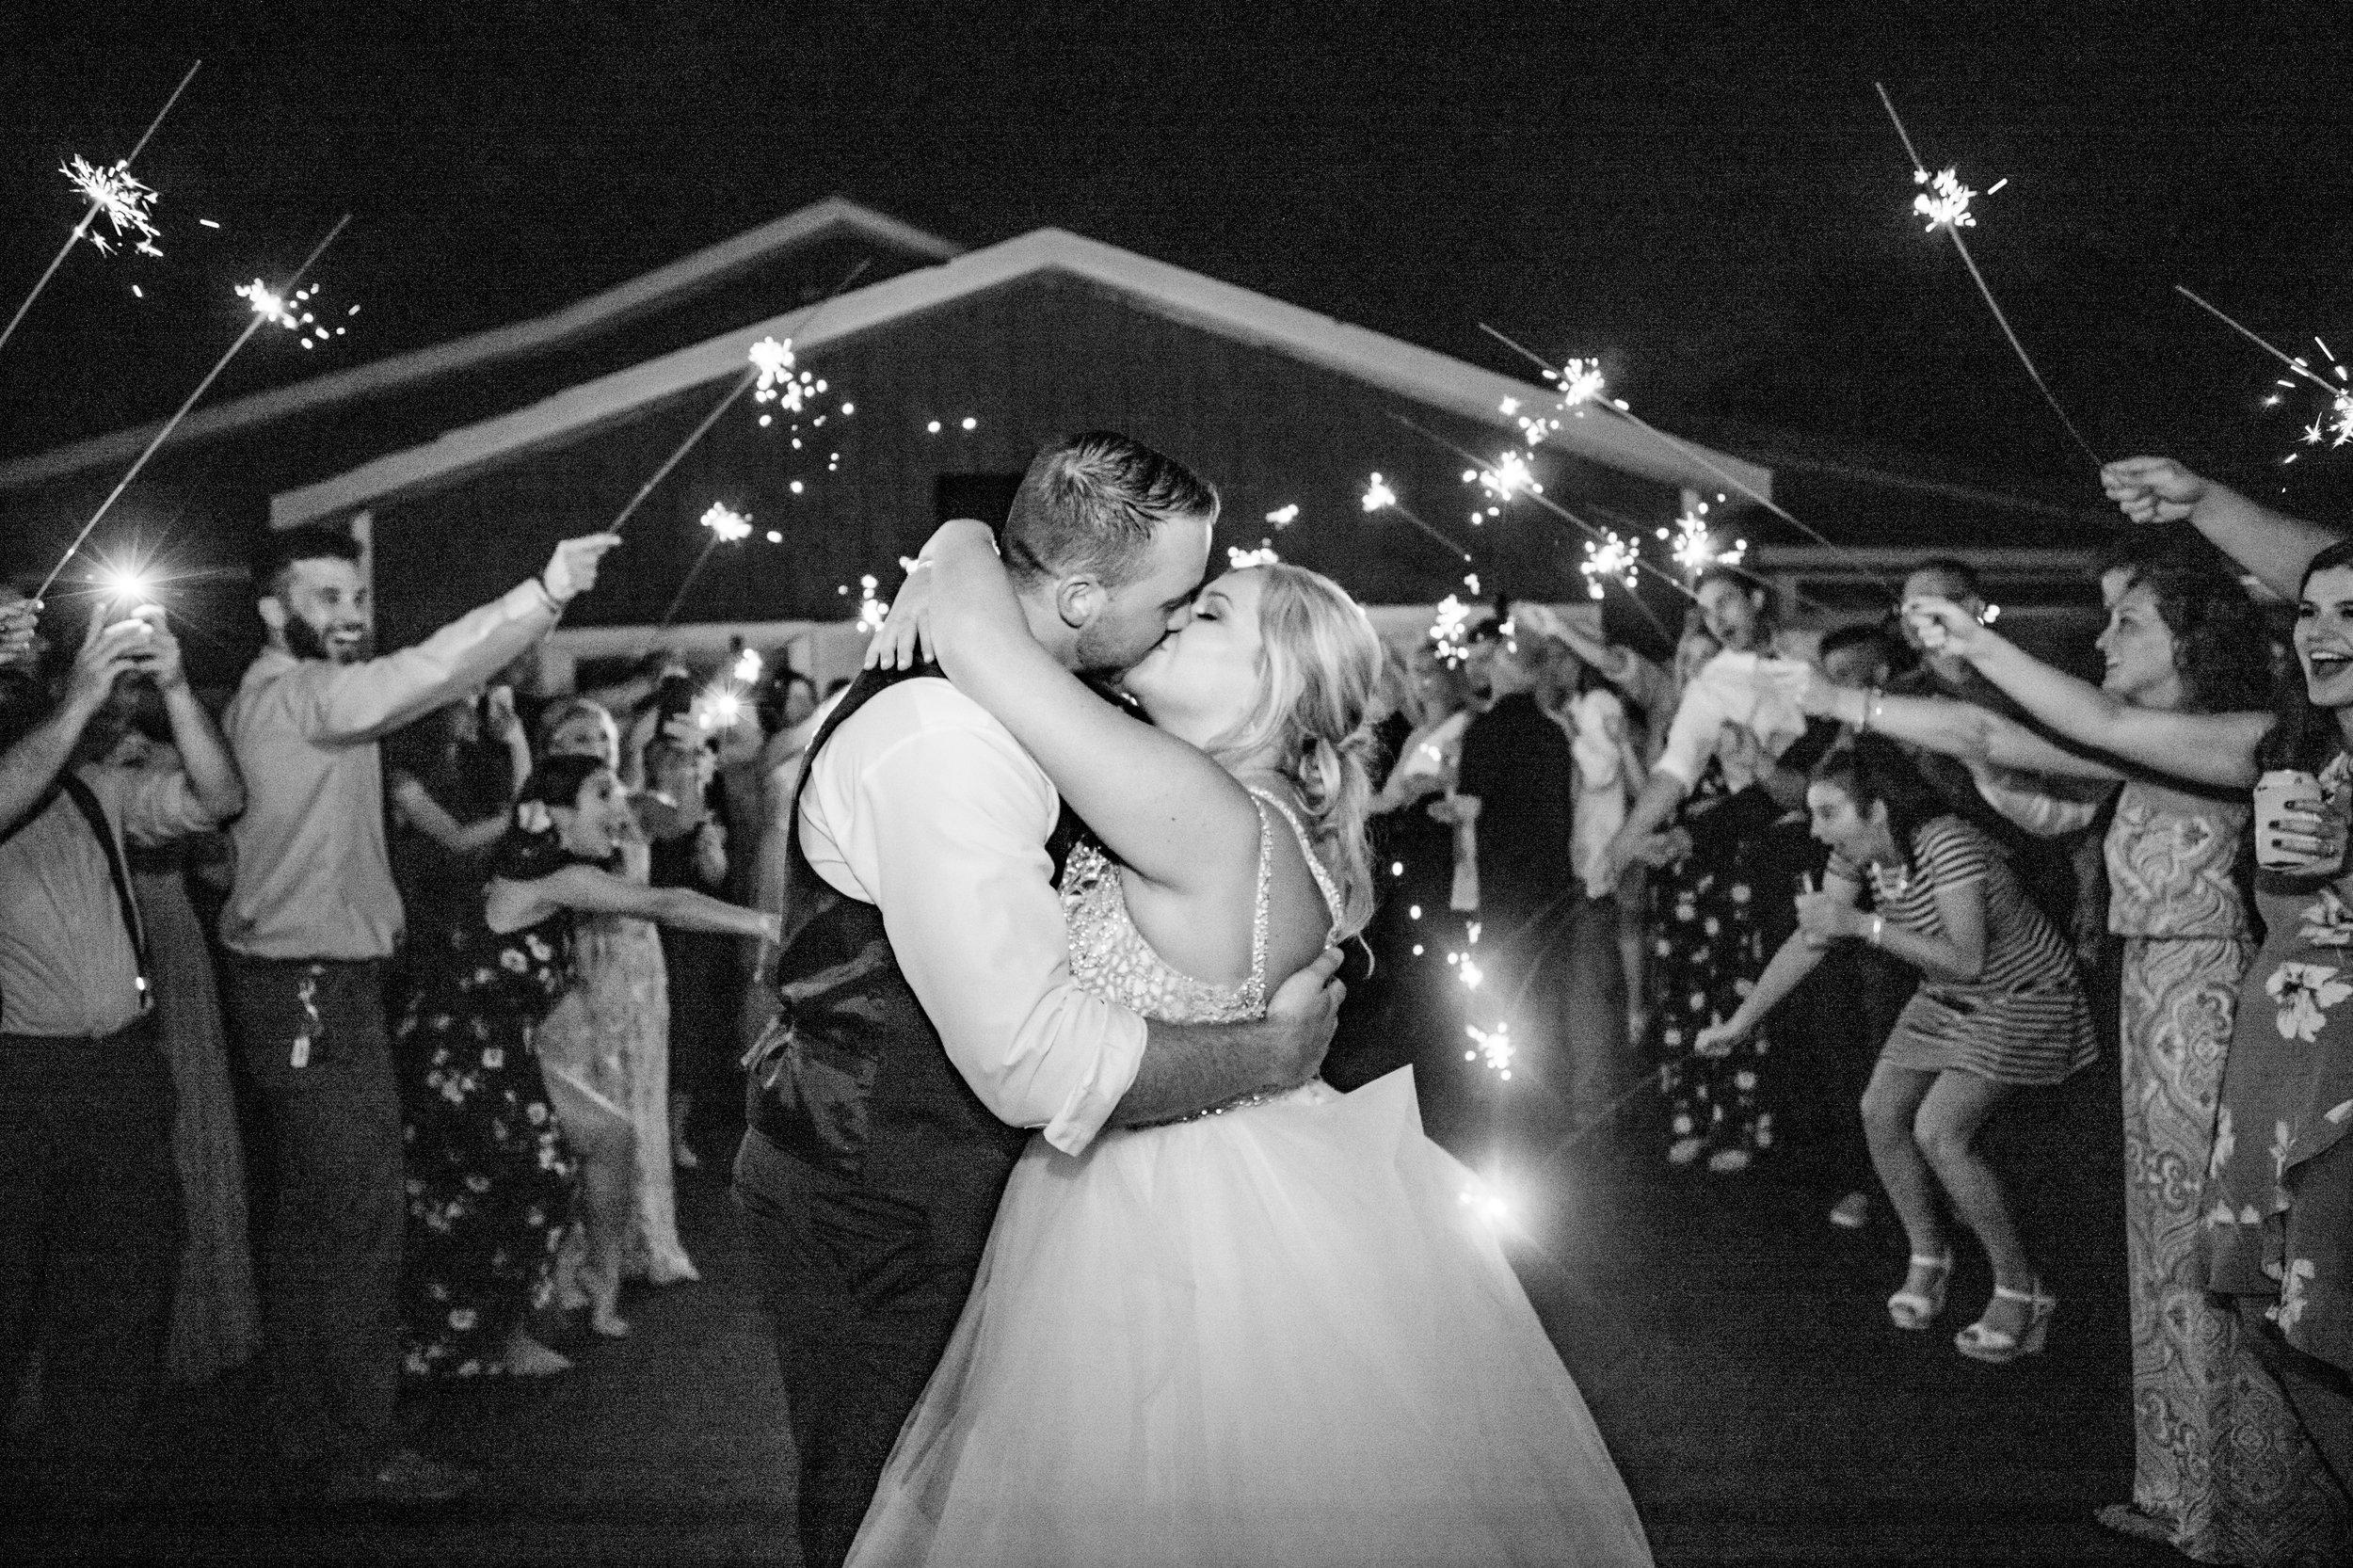 The-Place-at-534-wedding-l.a.r.weddings-lindsey-ramdin-cleveland-wedding-photographer-190.jpg